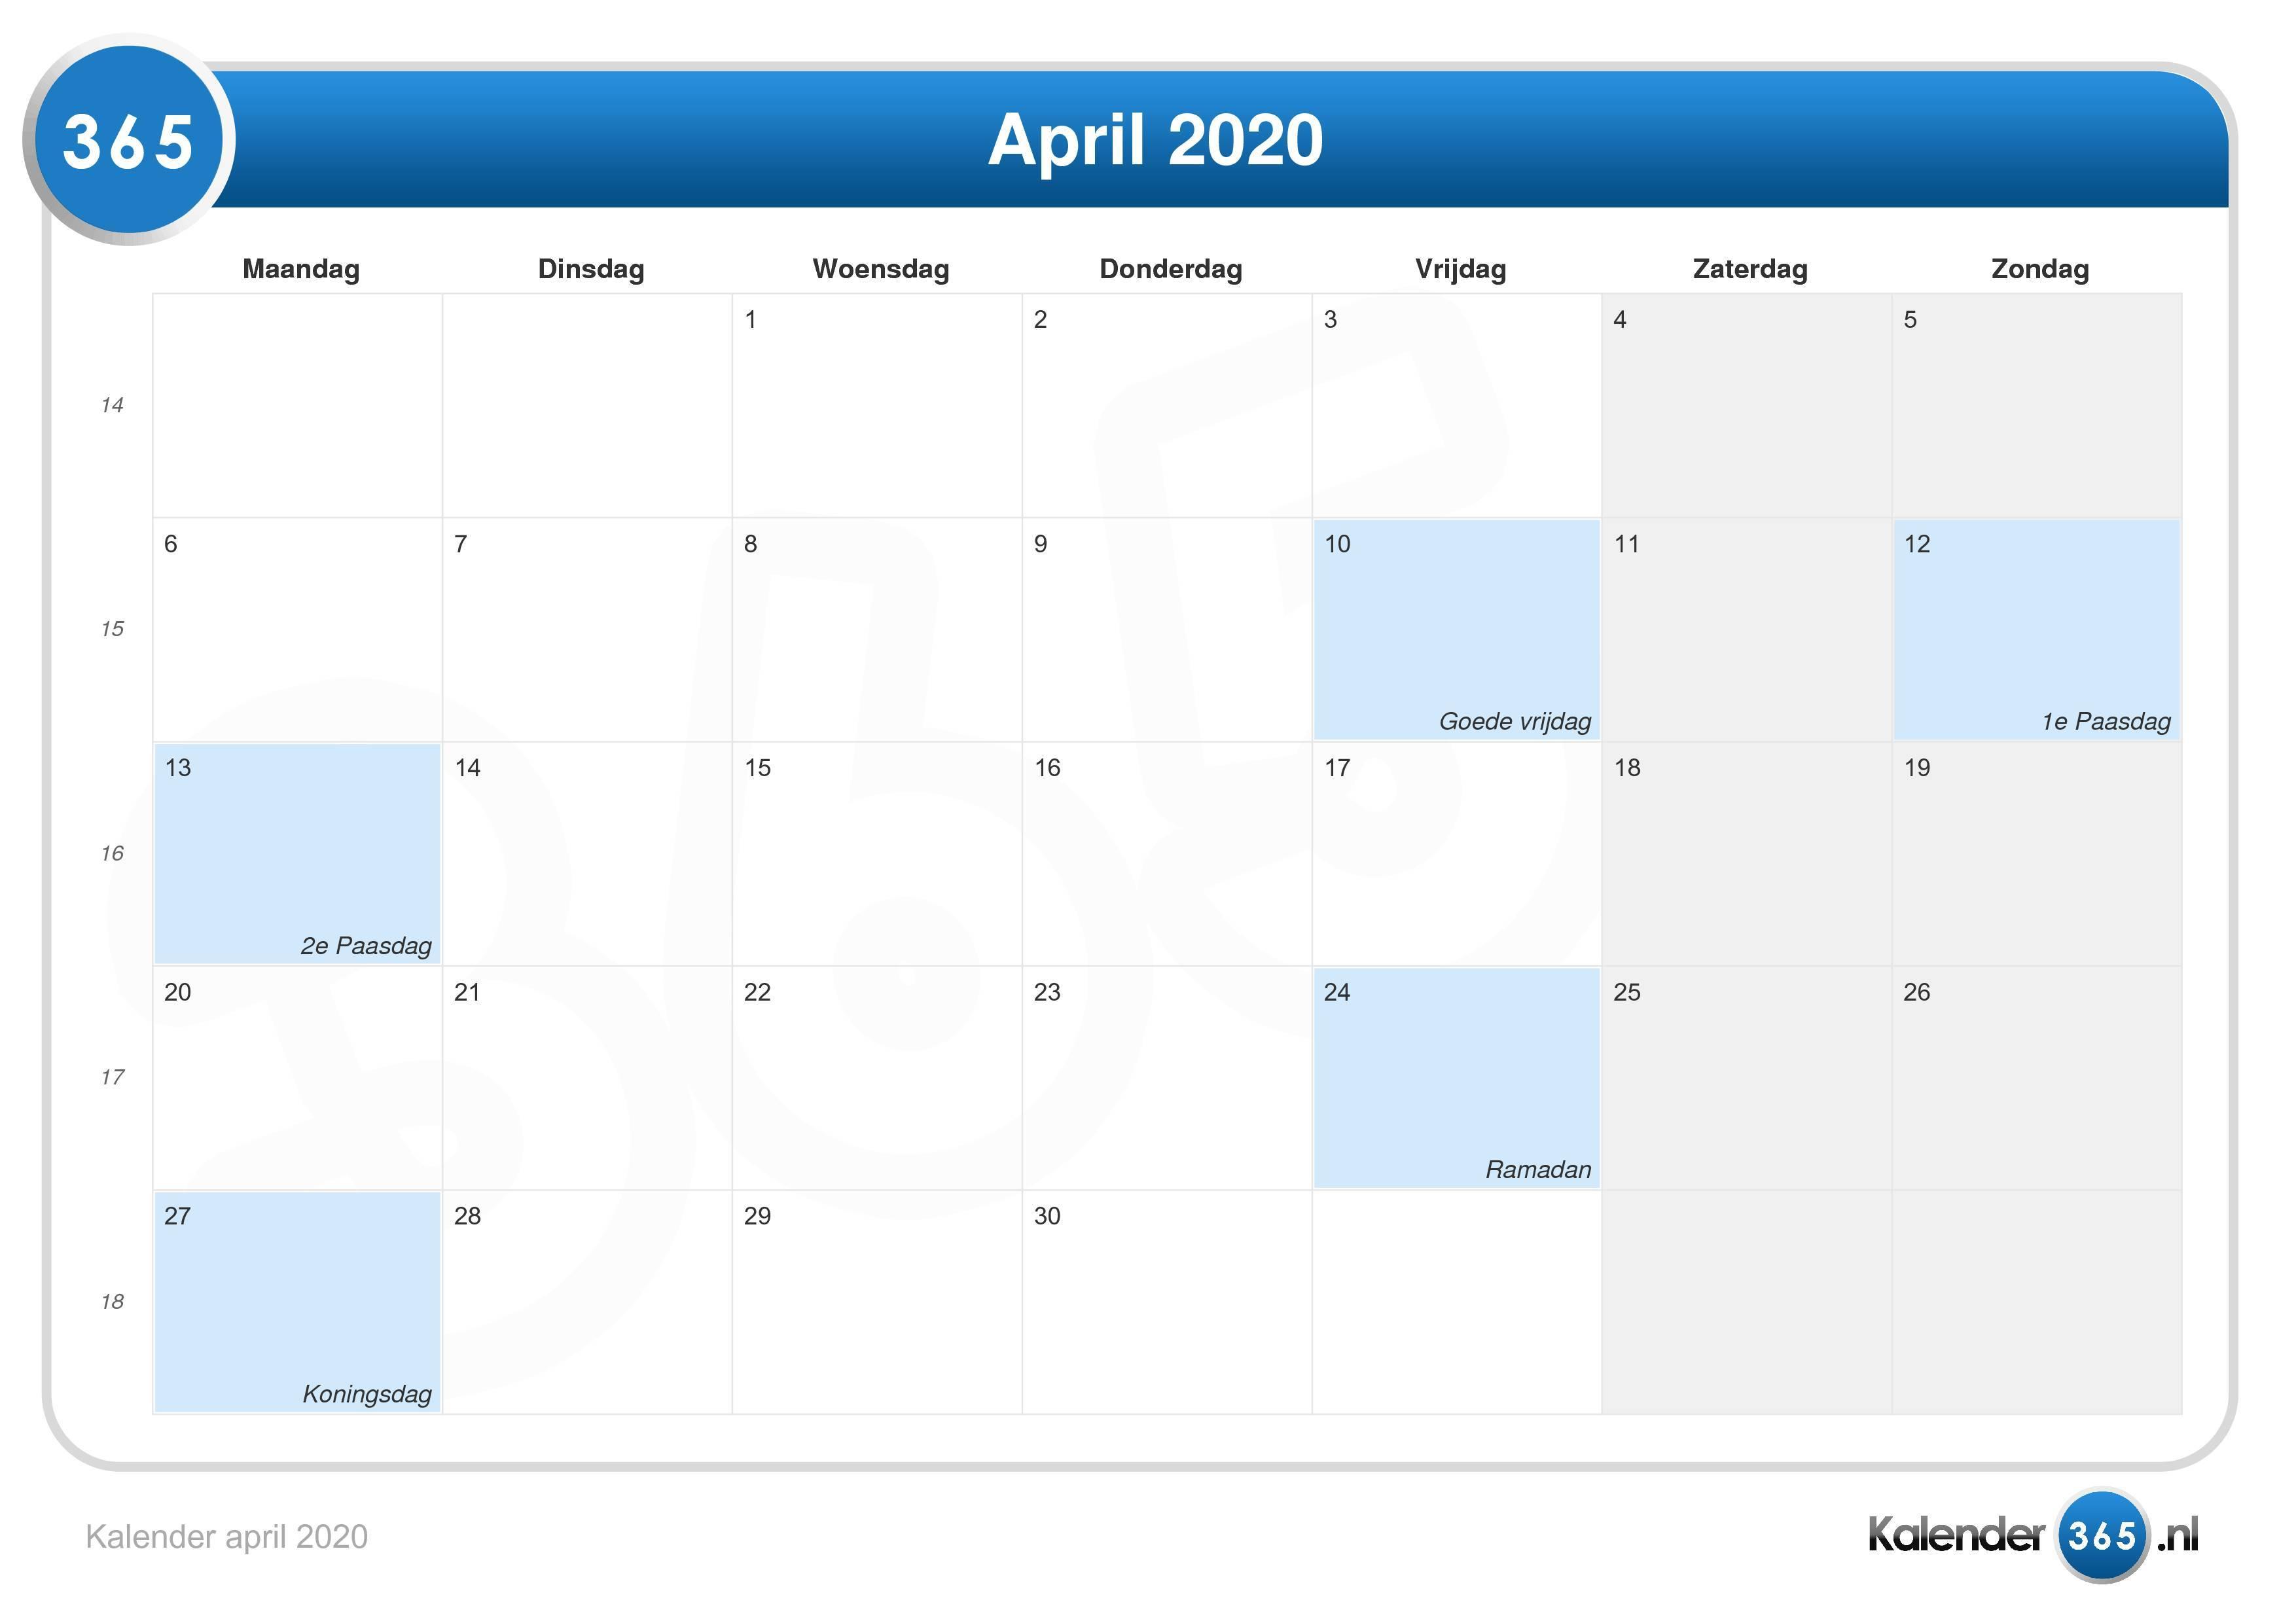 Uitslag Staatsloterij 27 April 2021